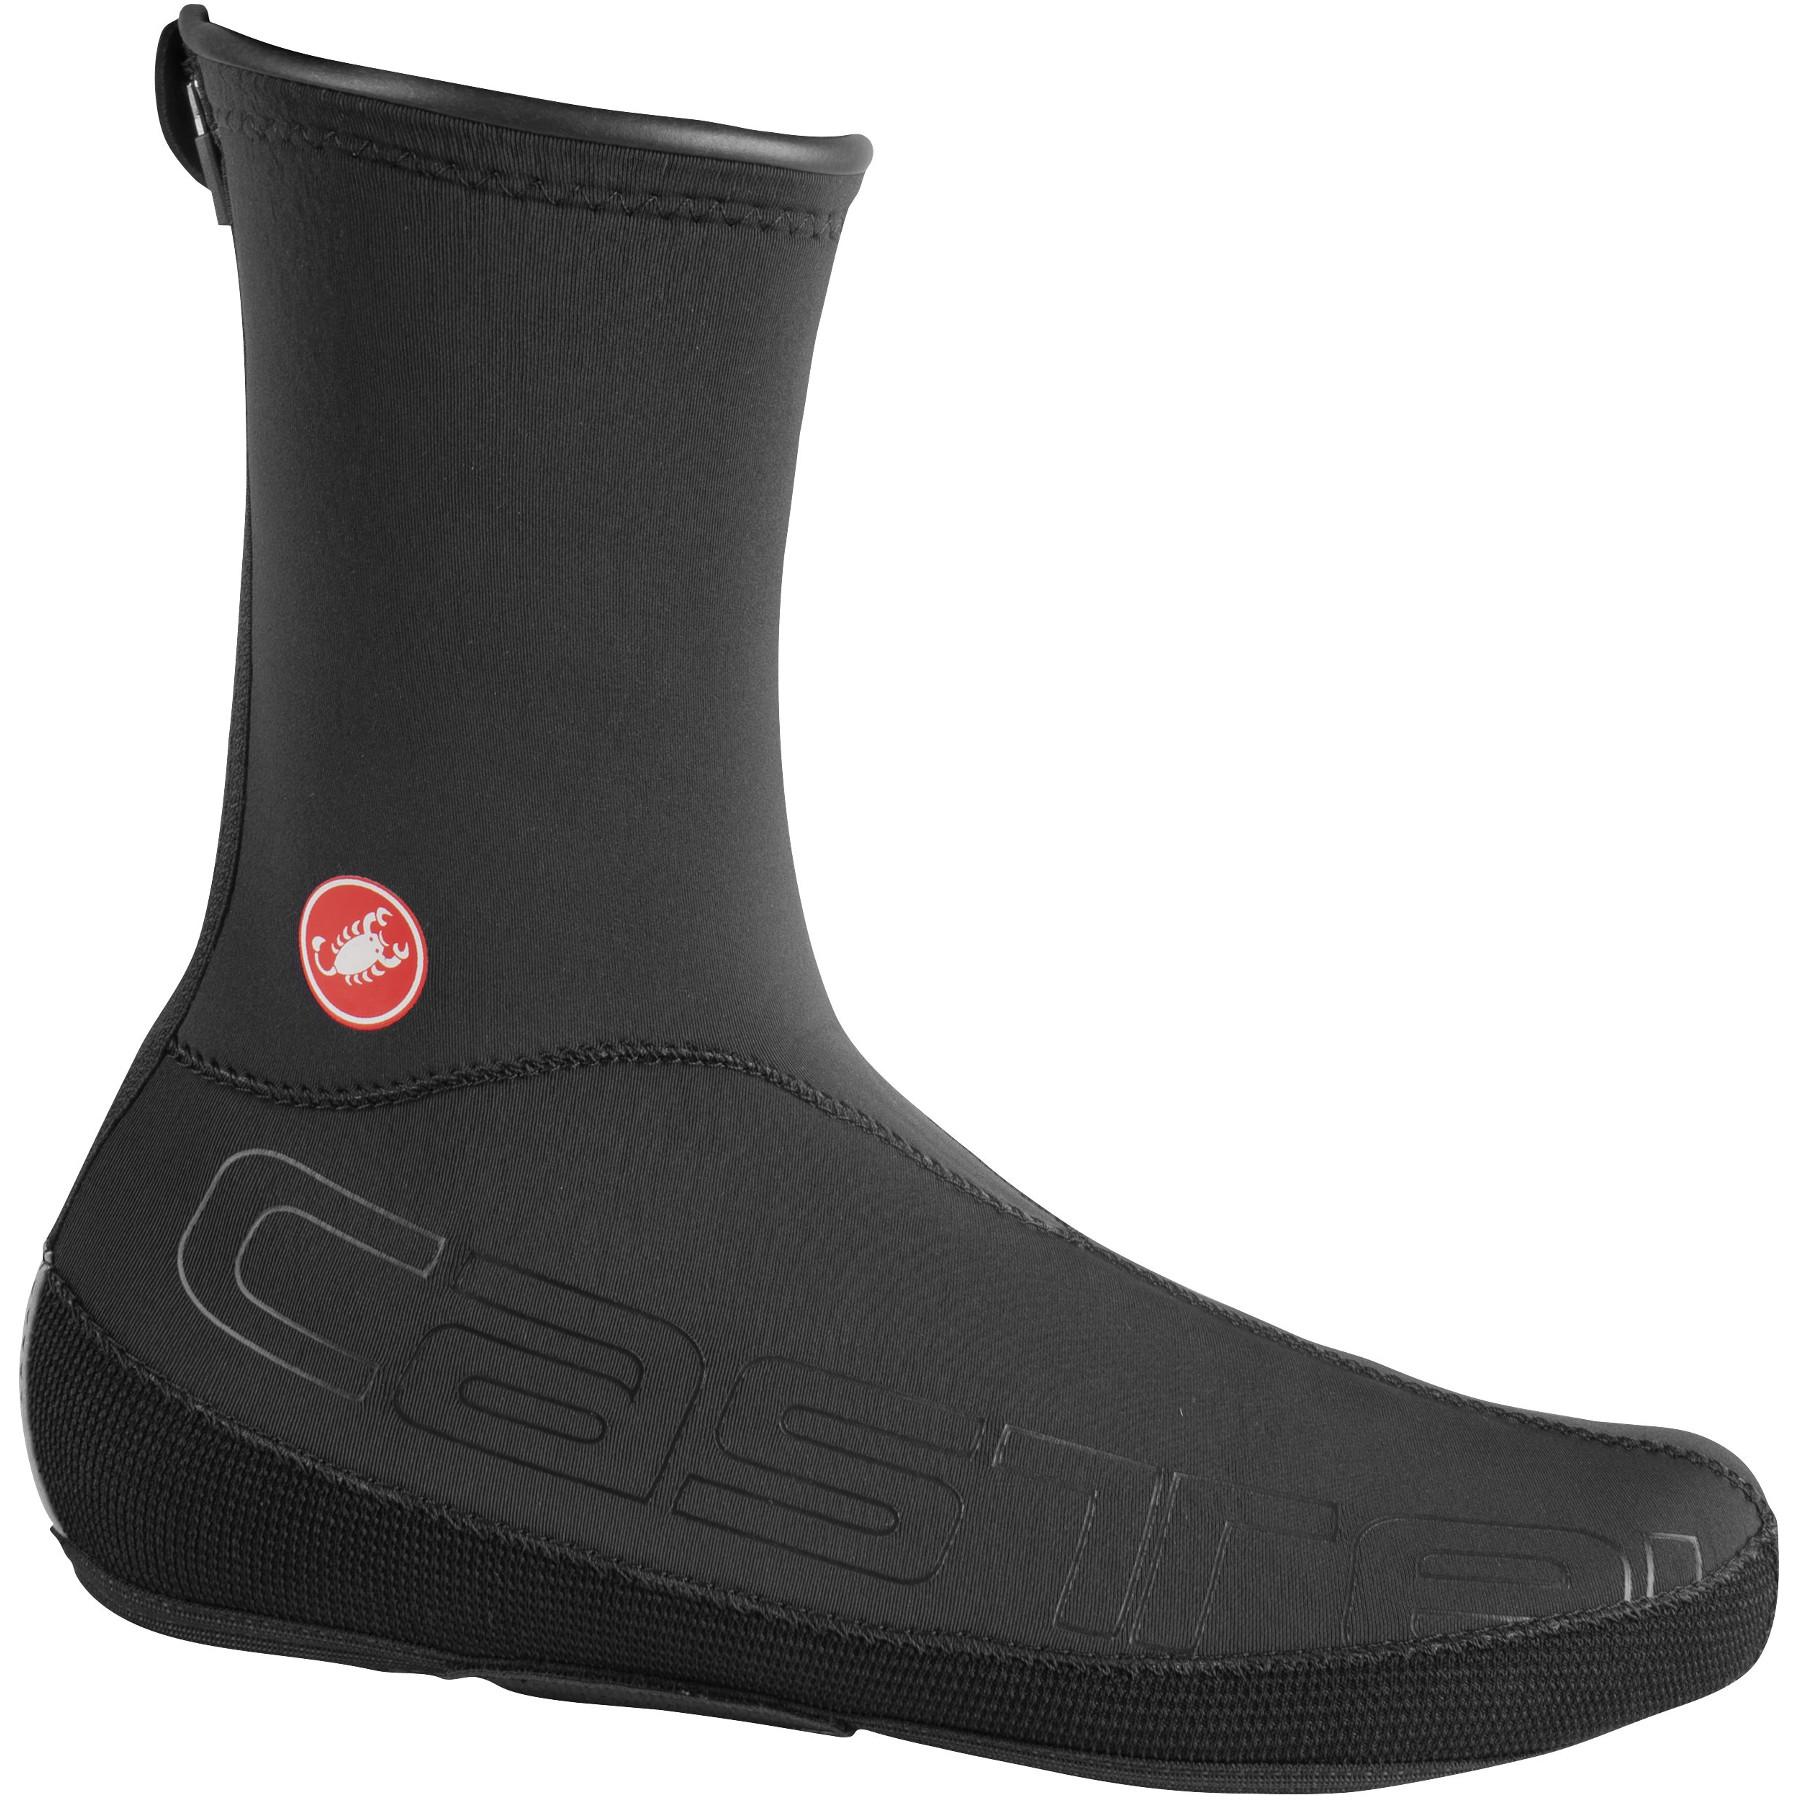 Image of Castelli Diluvio UL Shoecover - black/black 110